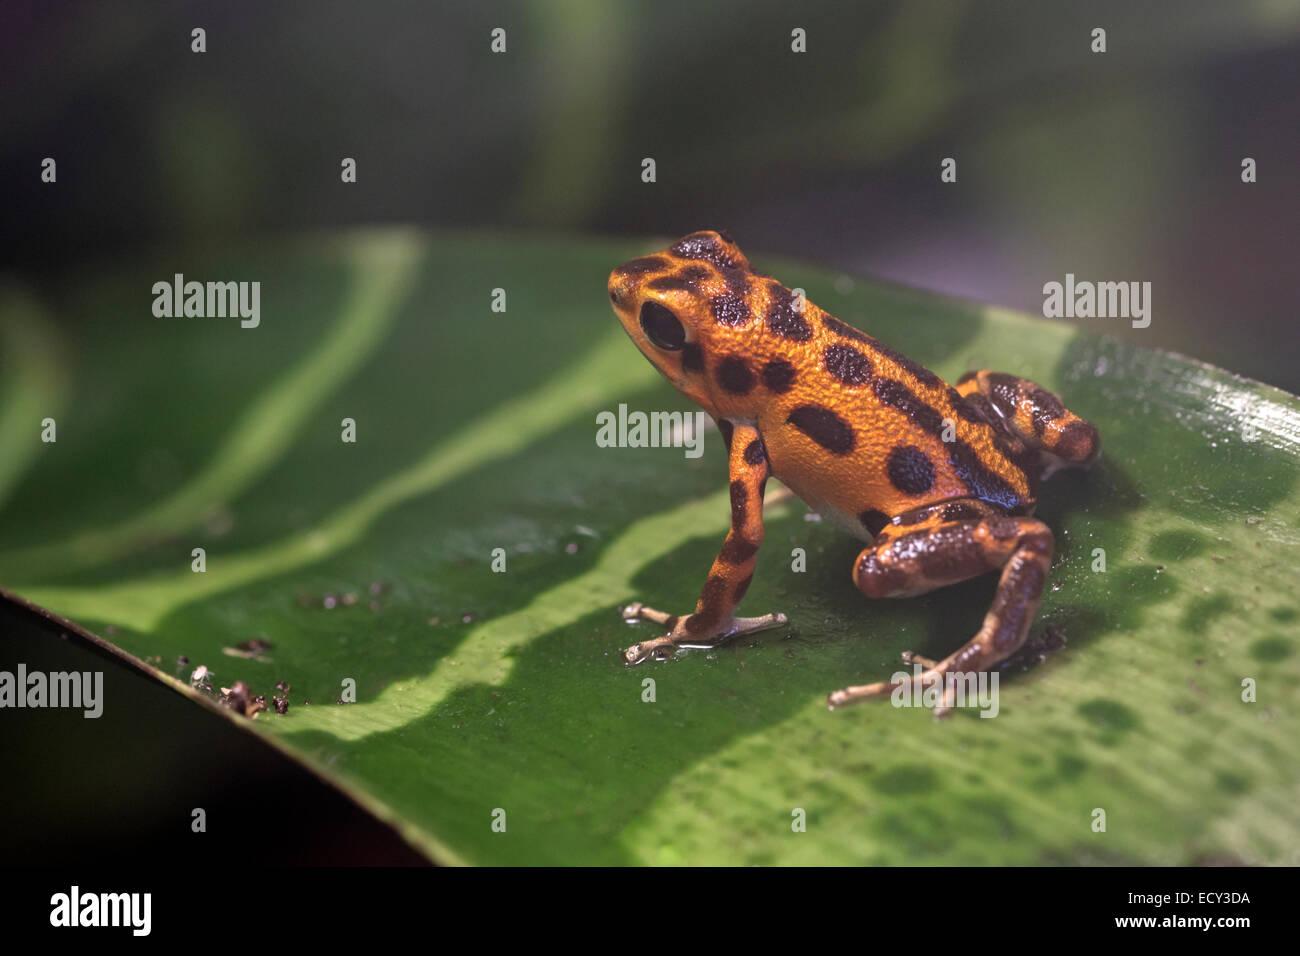 Poison dart frog (Oophaga pumilio) - Stock Image